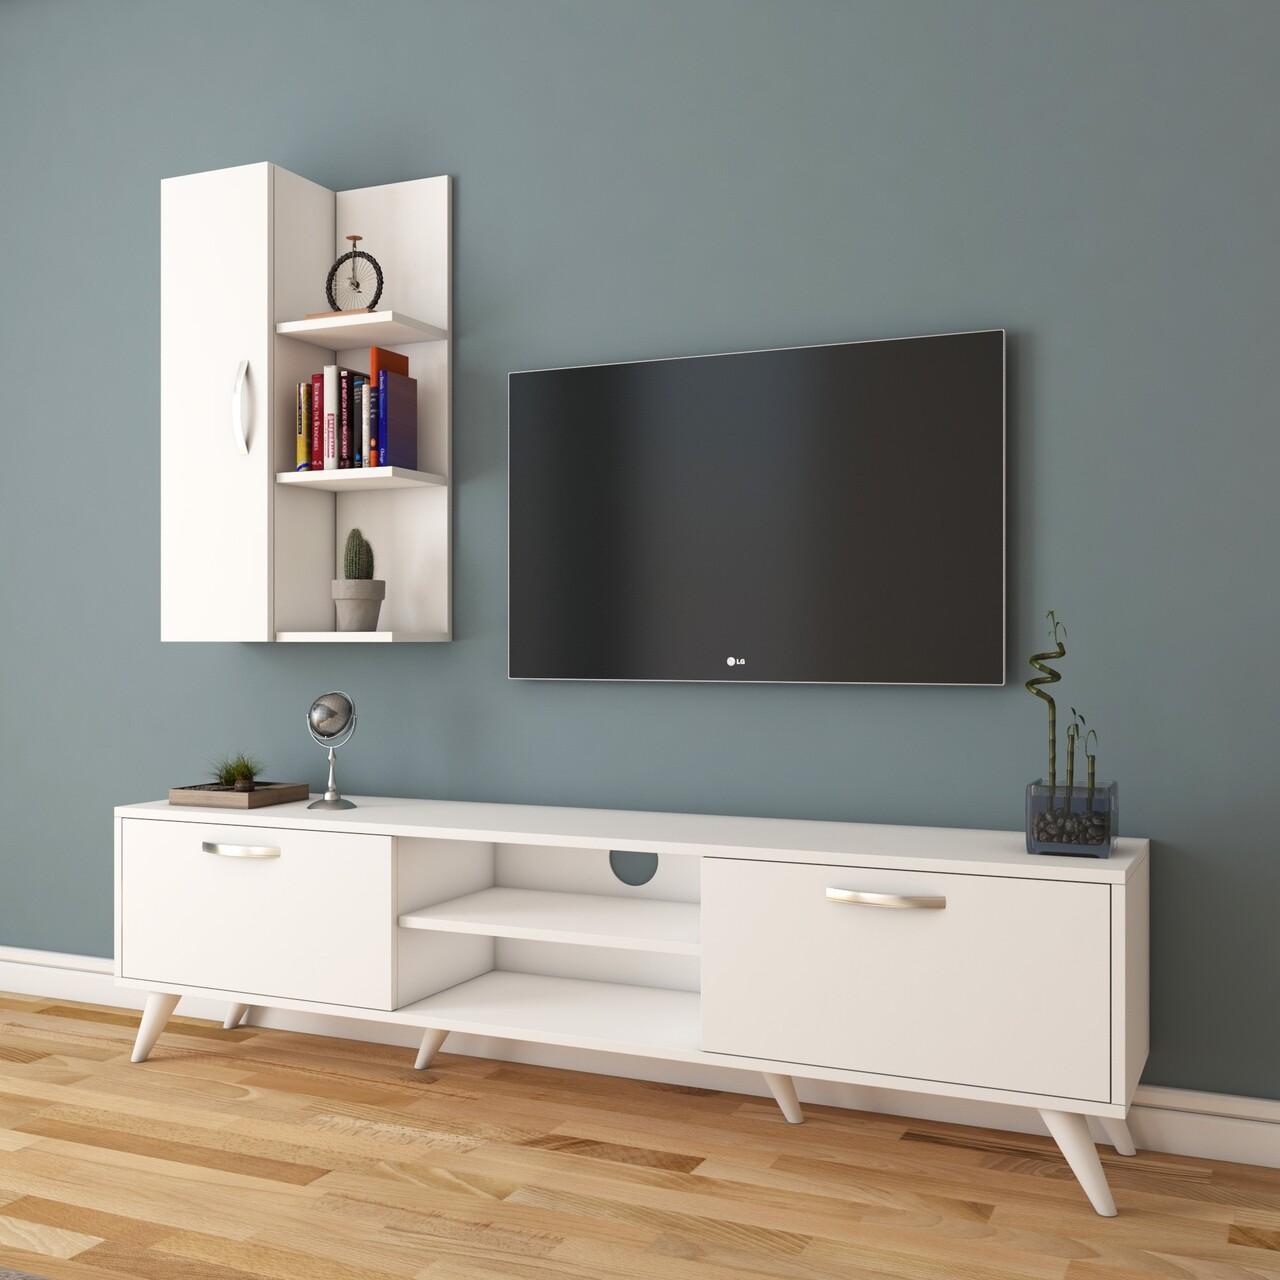 Comoda TV cu raft de perete si cabinet M47 - 322, Wren, 180 x 35 x 48.6 cm/90 cm, white